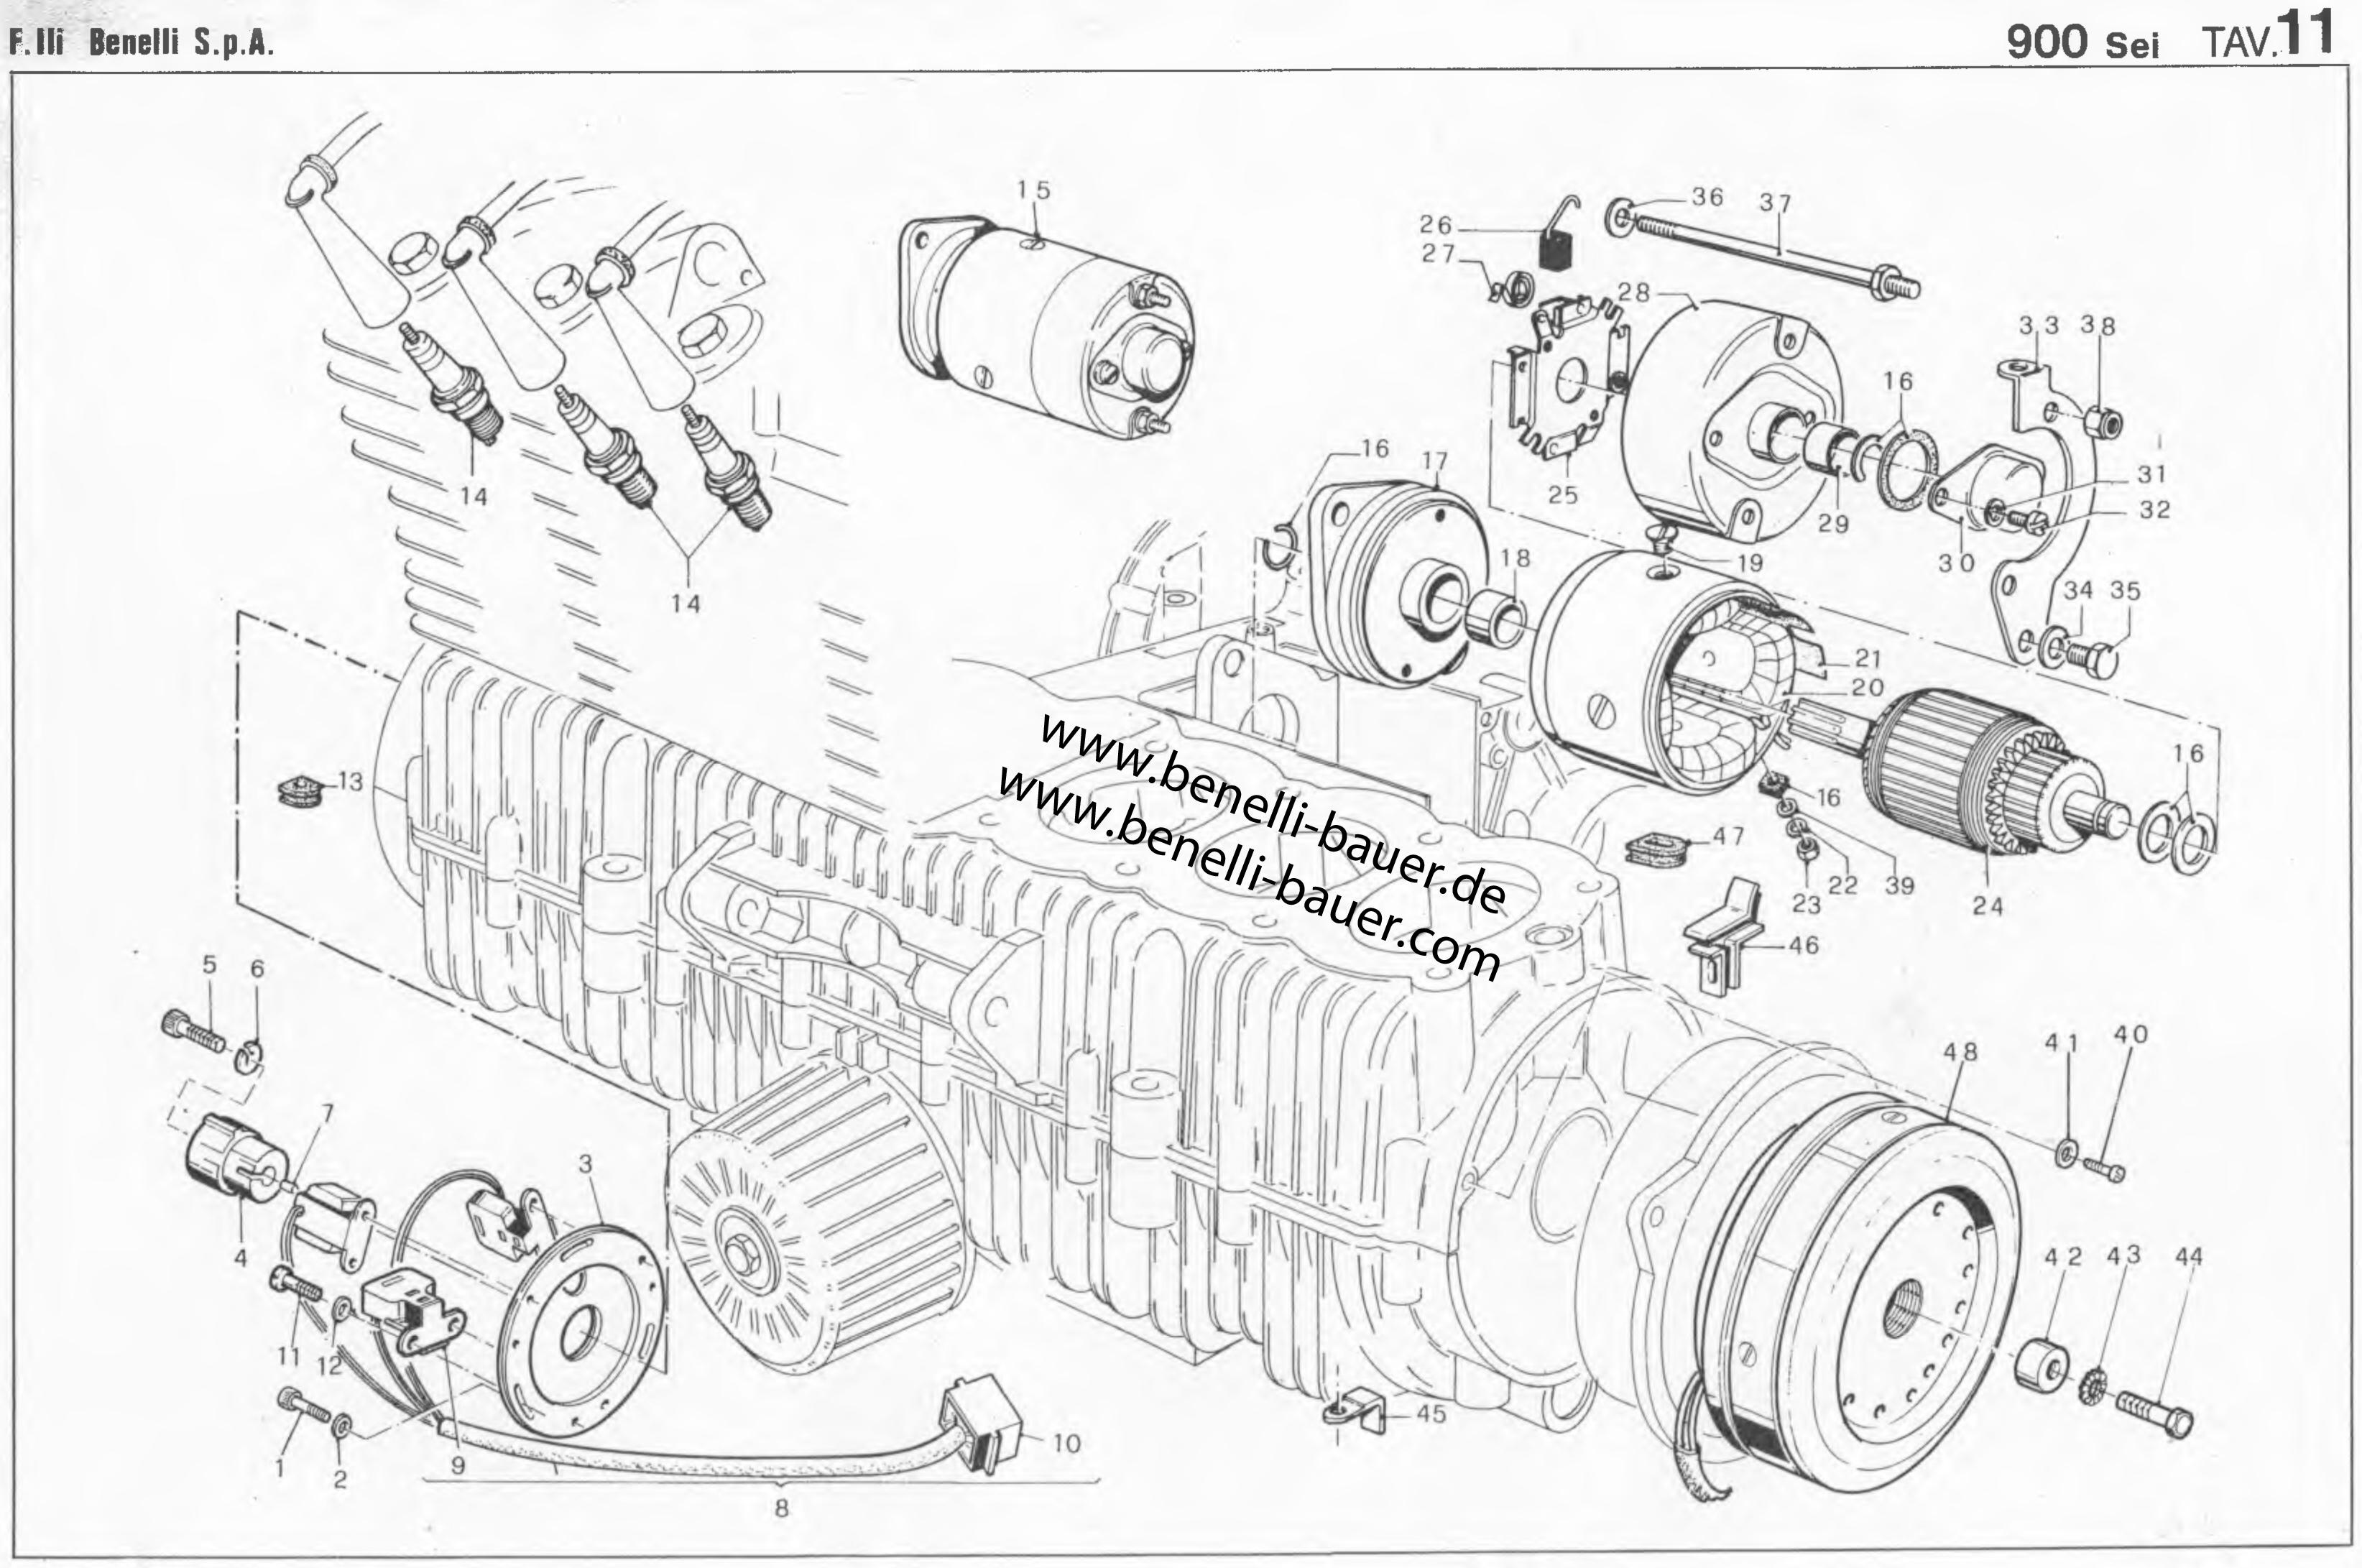 1999 Dyna Wide Glide Wiring Diagram Harley Supper Glide Wiring Diagram on